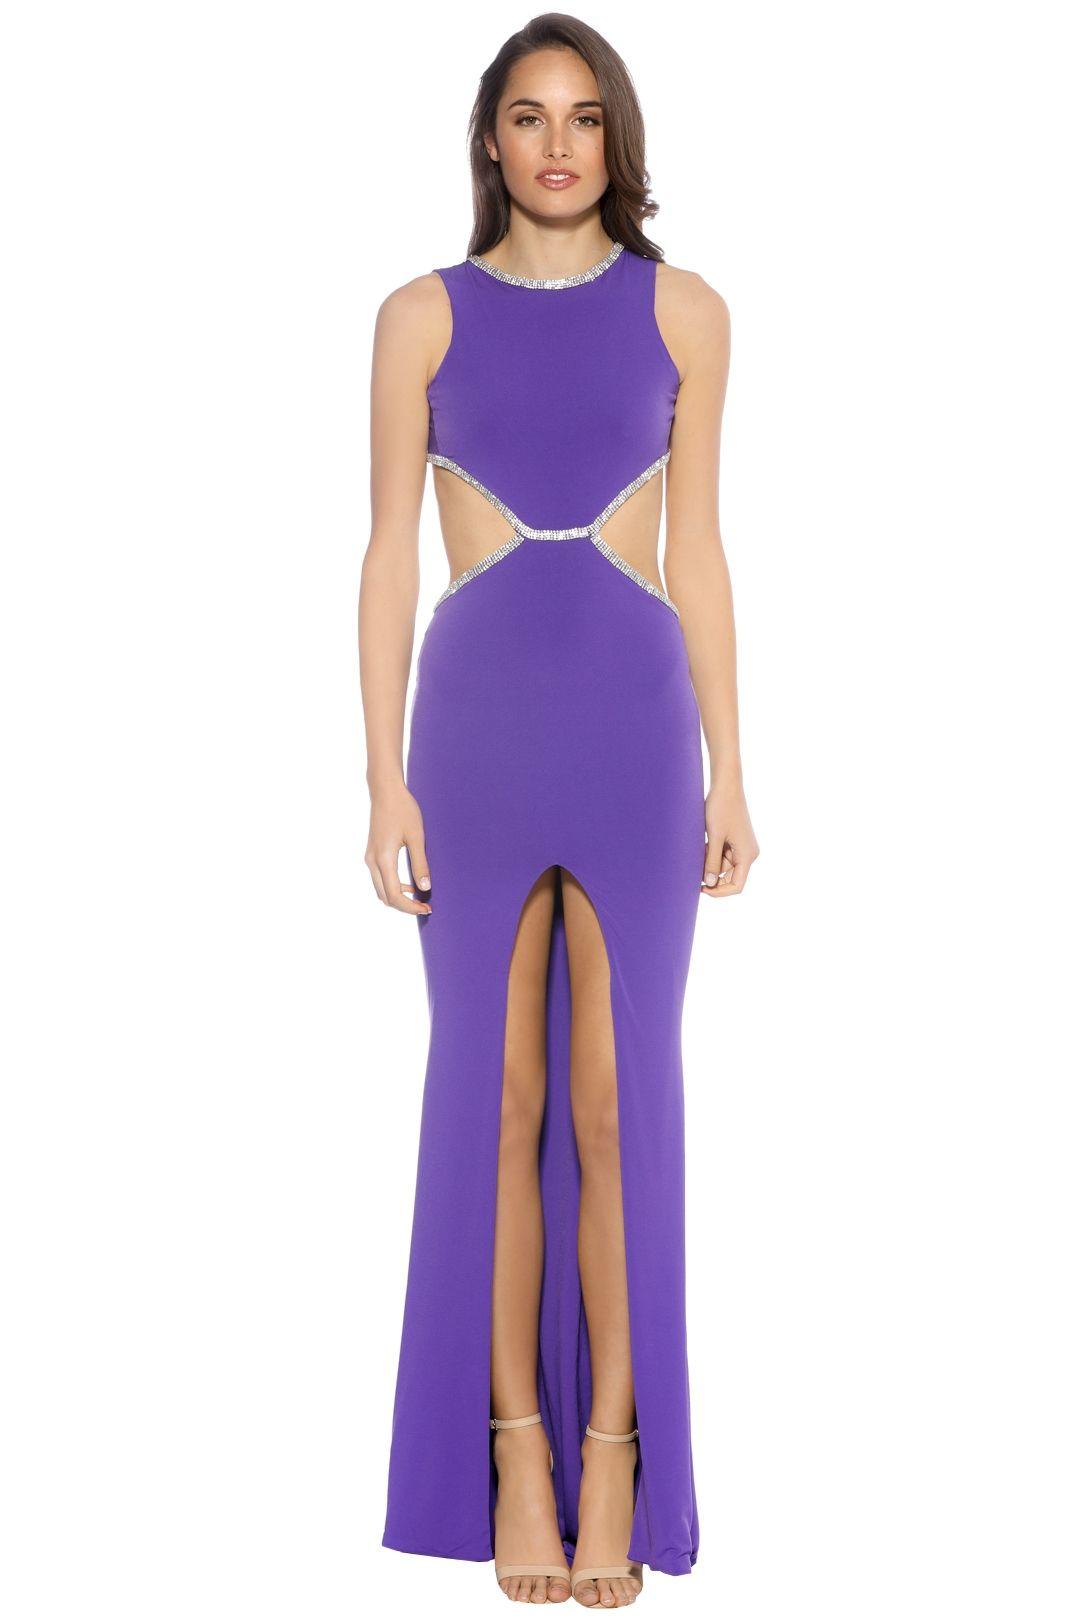 SKIVA - Open Back Evening Dress - Purple - Front